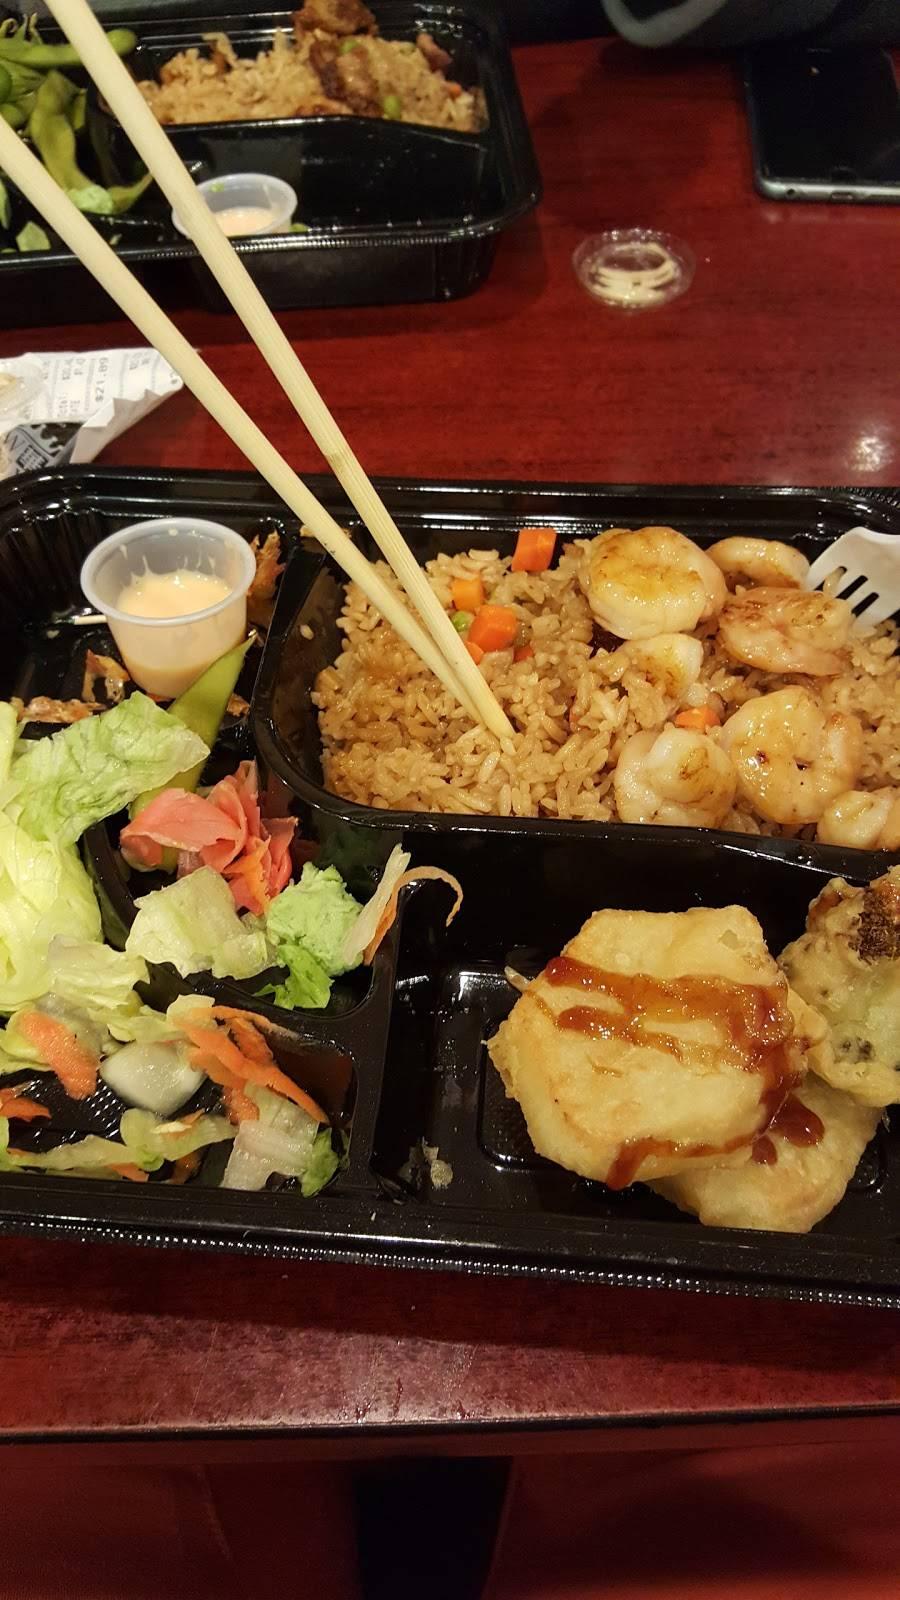 Sarku Japan Teriyaki & Sushi Express | restaurant | 176A Elmora Ave, Elizabeth, NJ 07202, USA | 9082891900 OR +1 908-289-1900